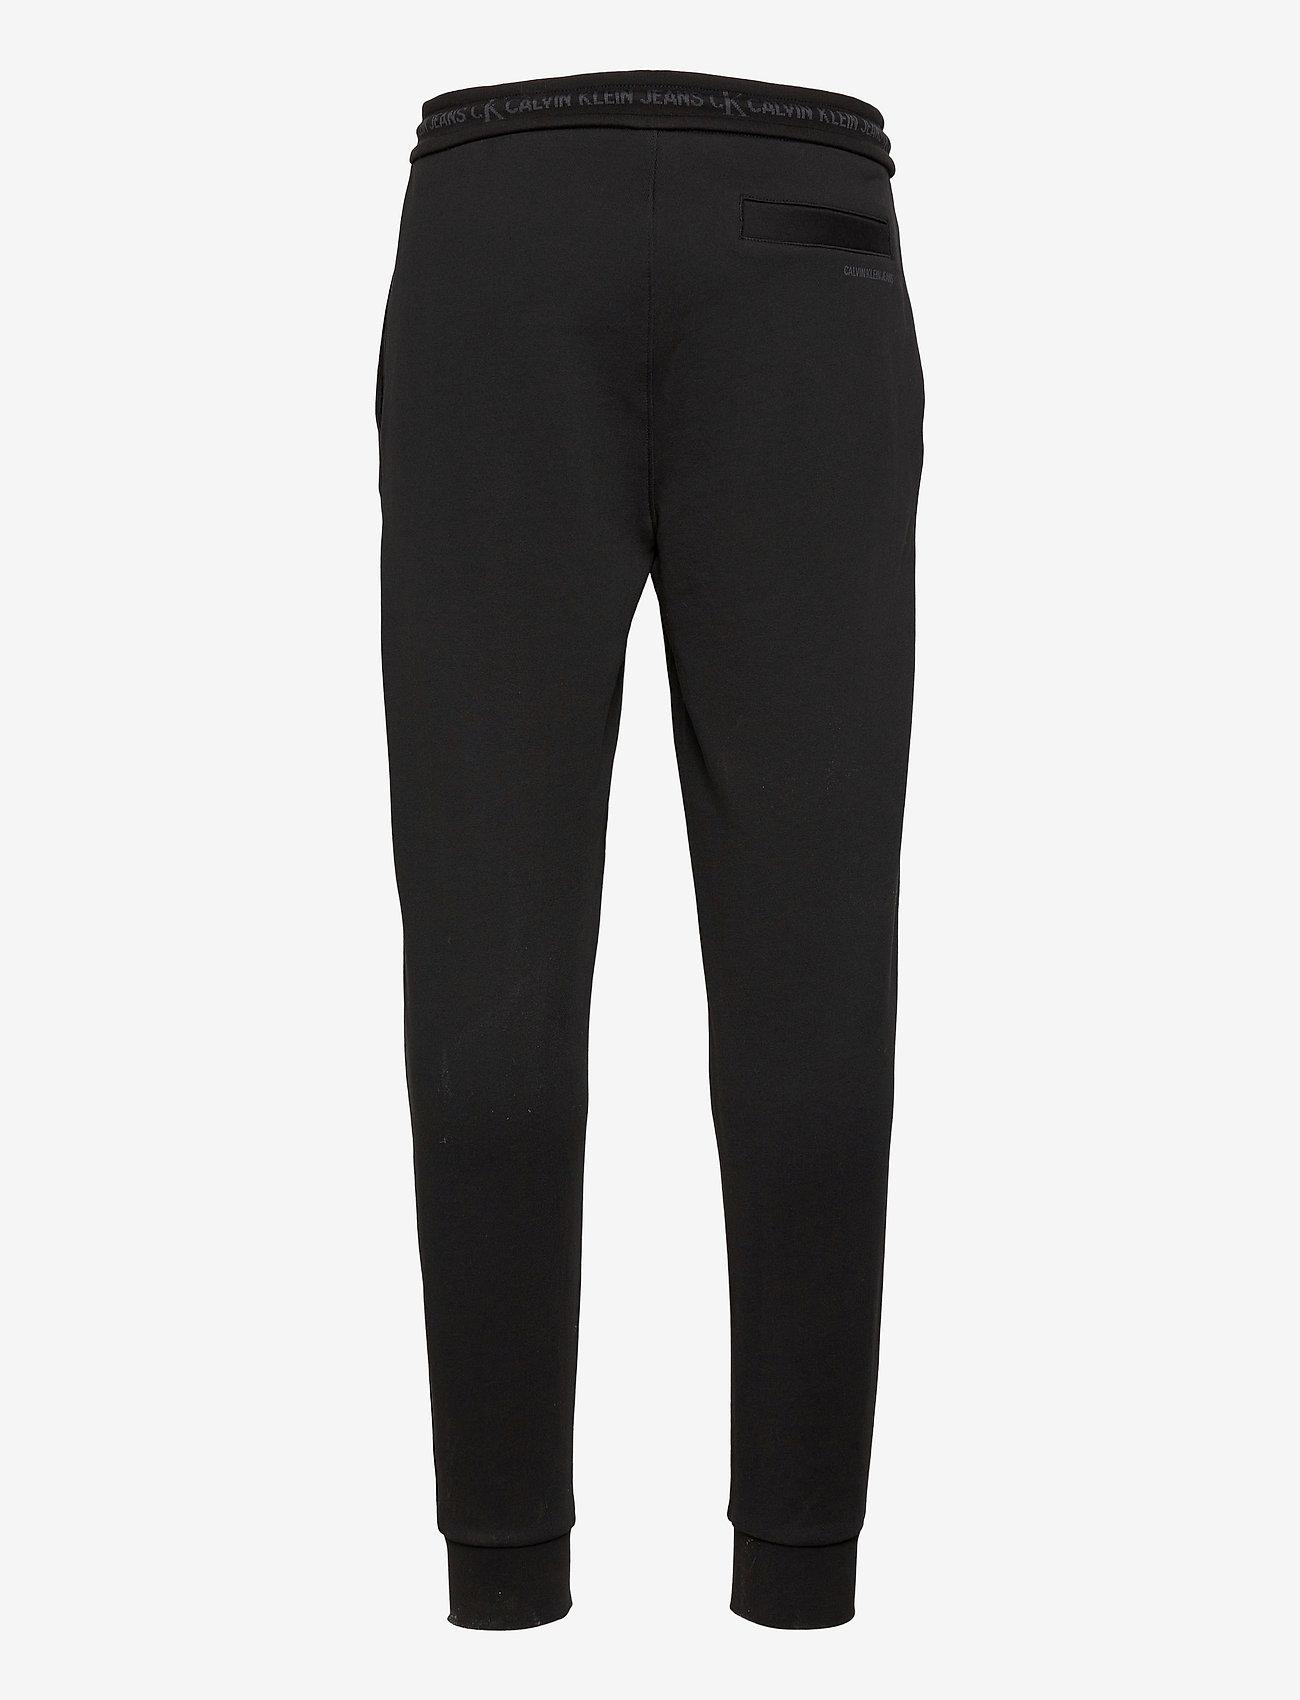 Calvin Klein Jeans - LOGO JACQUARD HWK PANT - kleding - ck black - 0